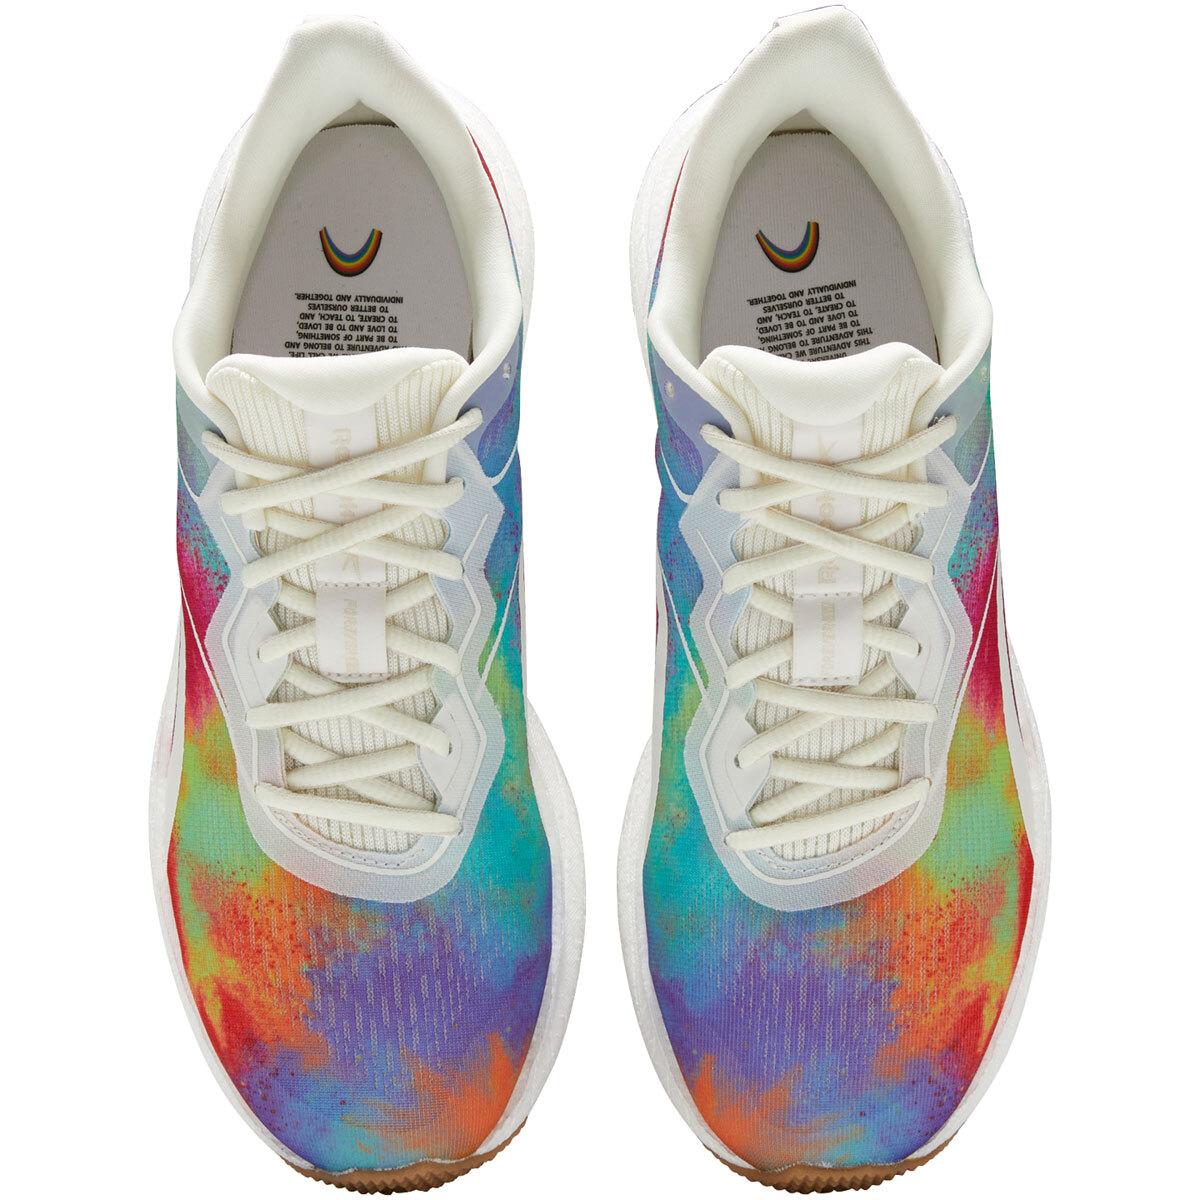 Women's Reebok Forever Floatride Energy 2.0 Running Shoe - Color: Pride - Size: 5 - Width: Regular, Pride, large, image 6